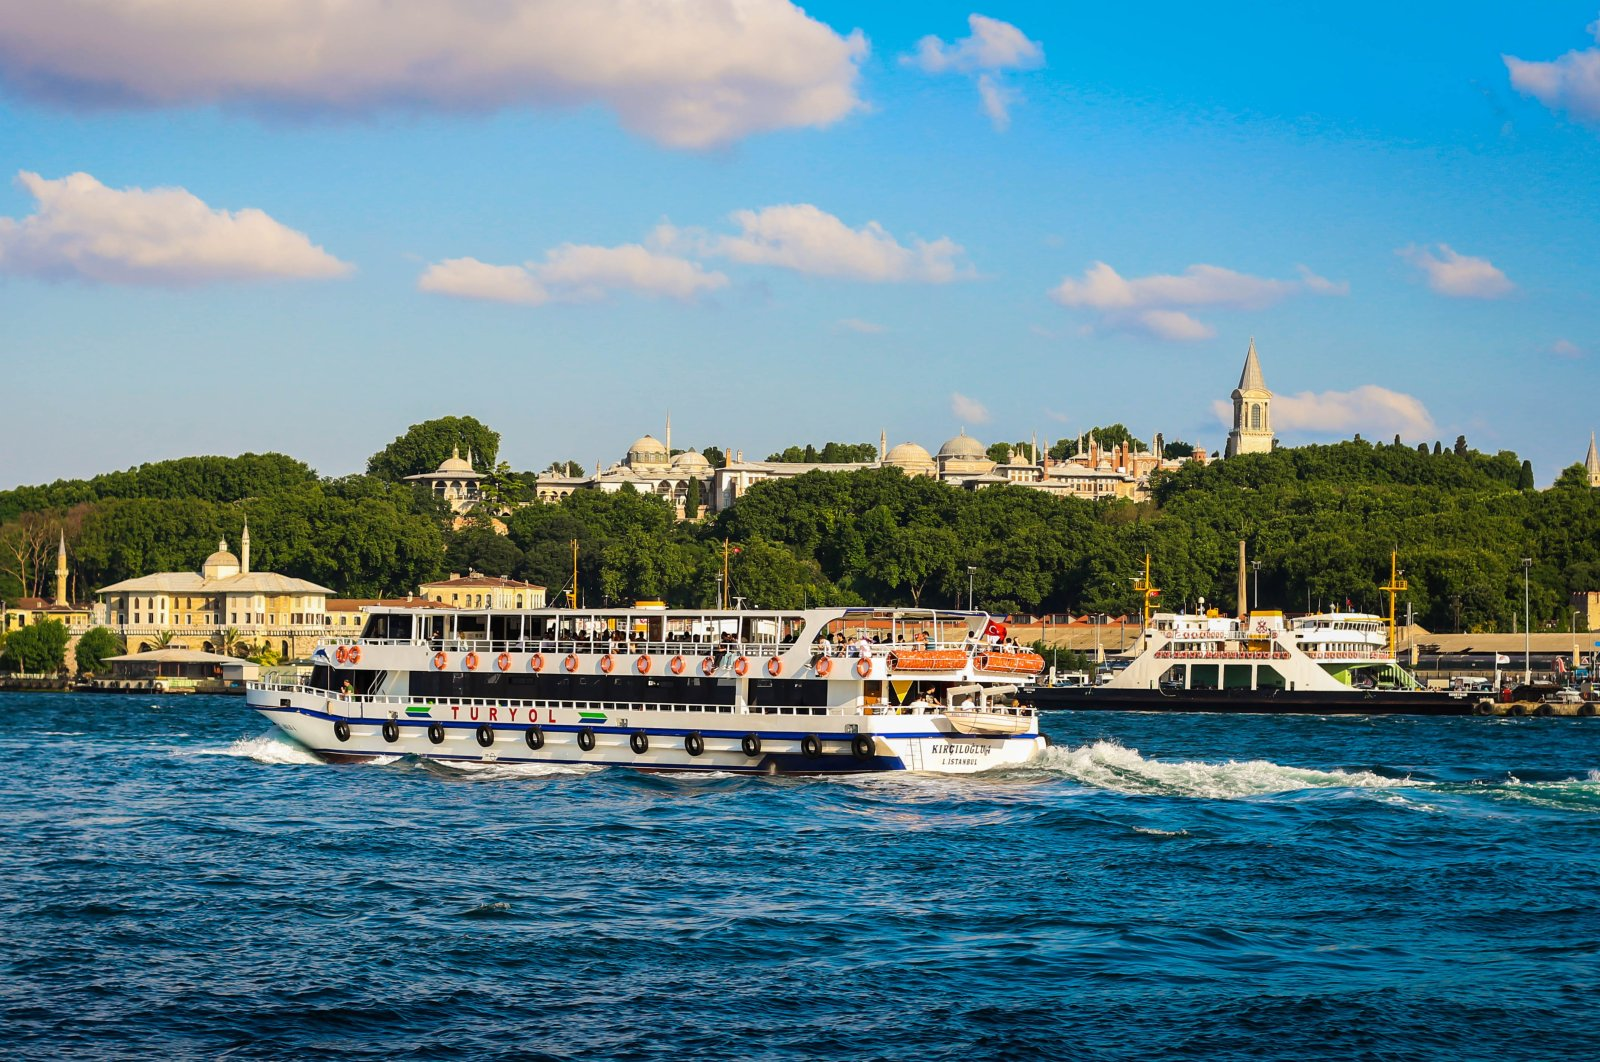 Ferry boat passing through Bosporus. (Shutterstock Photo)